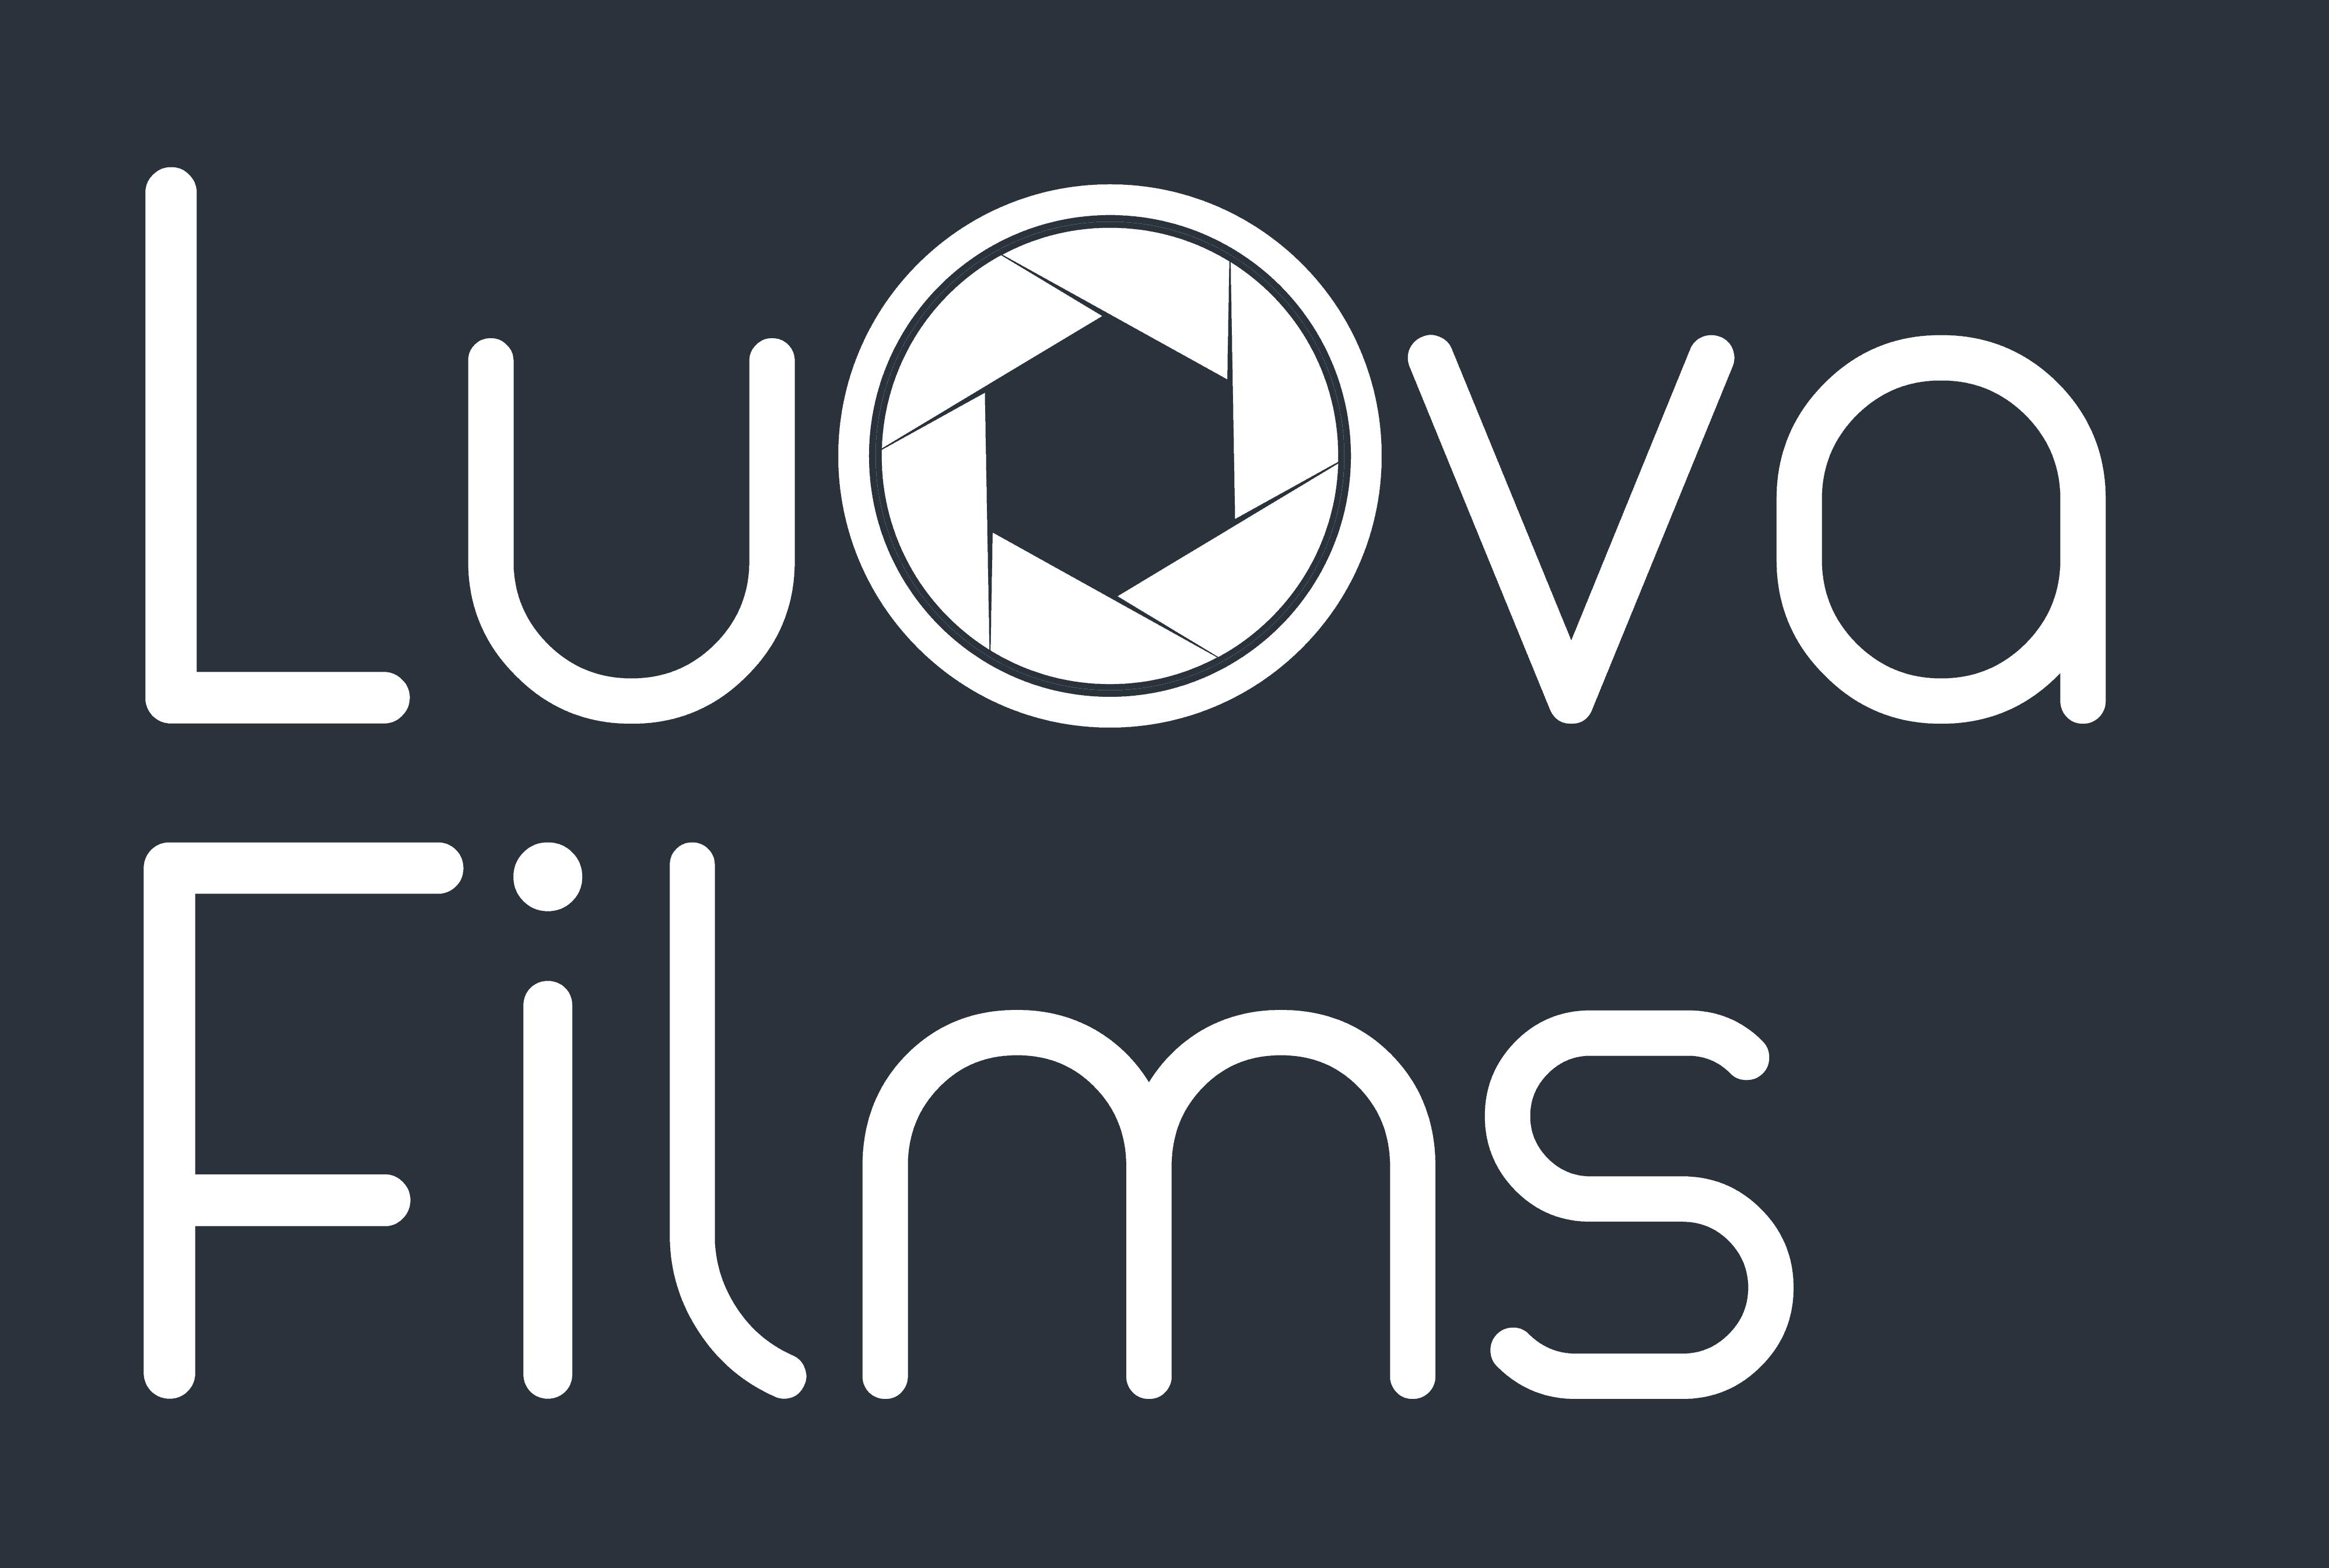 Luova Films